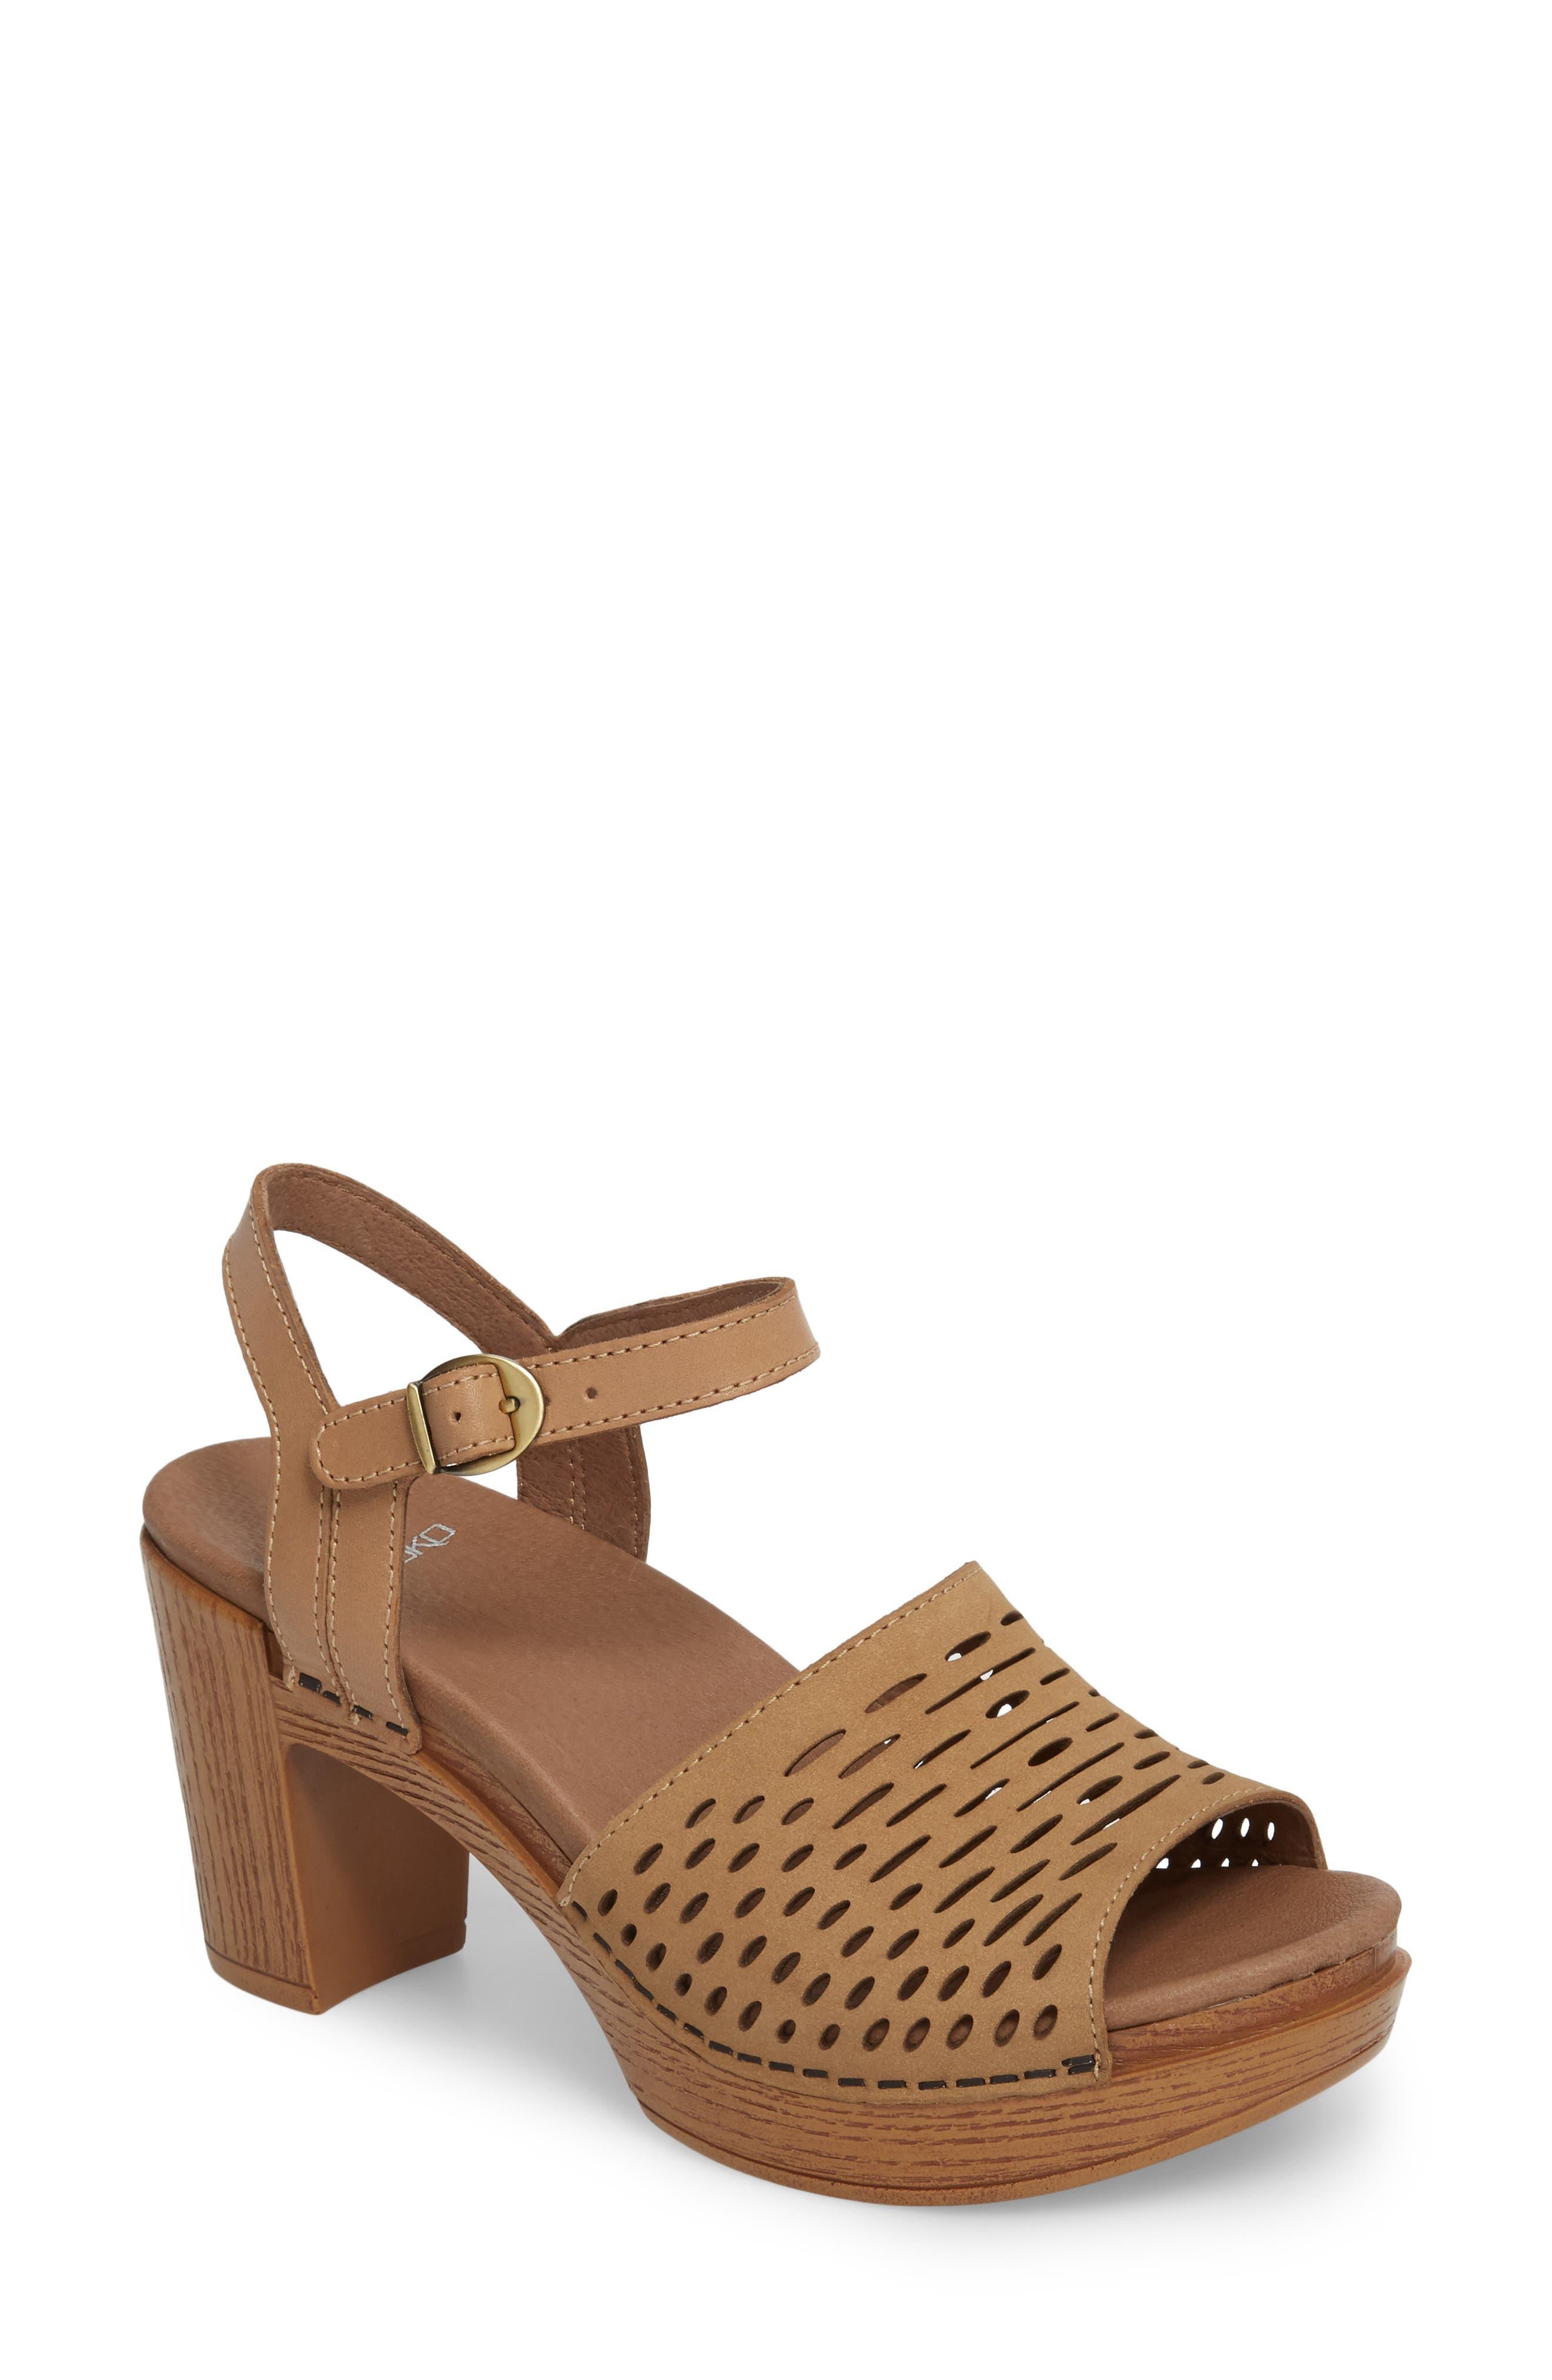 Denita Block Heel Sandal,                             Main thumbnail 1, color,                             SAND MILLED NUBUCK